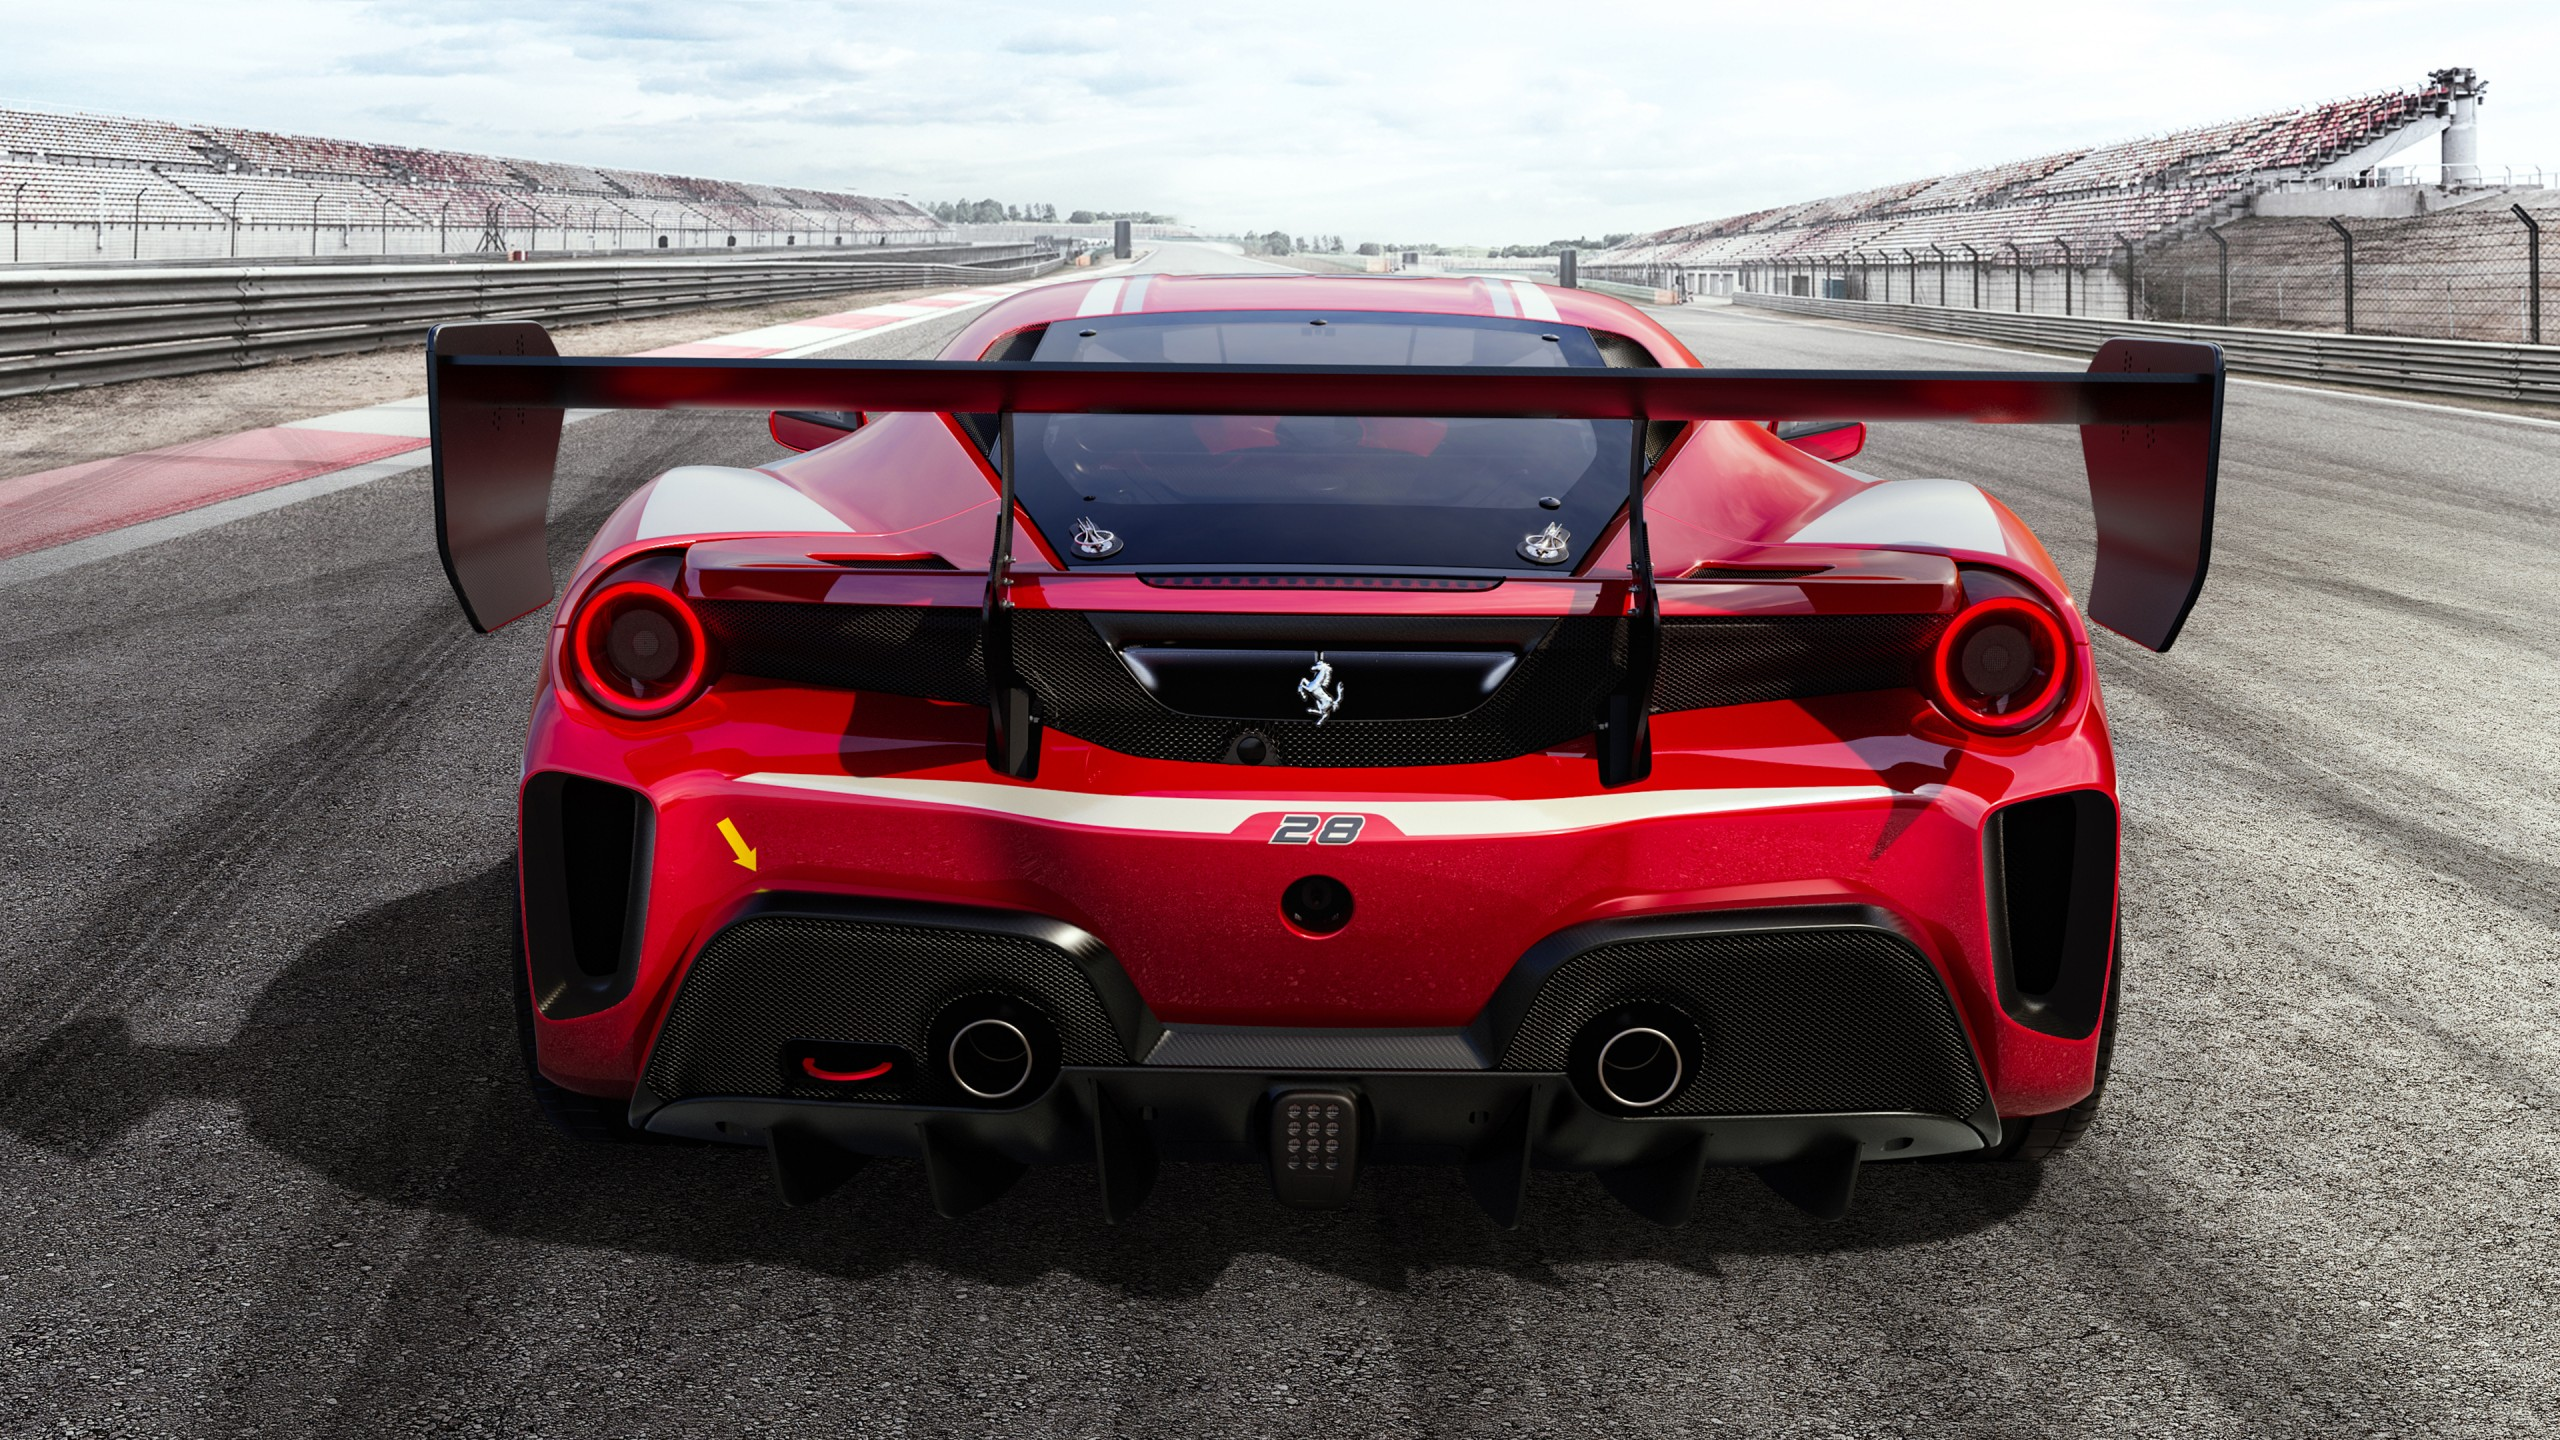 Ferrari 488 Challenge Evo 2020 4K 2 Wallpaper HD Car Wallpapers 2560x1440